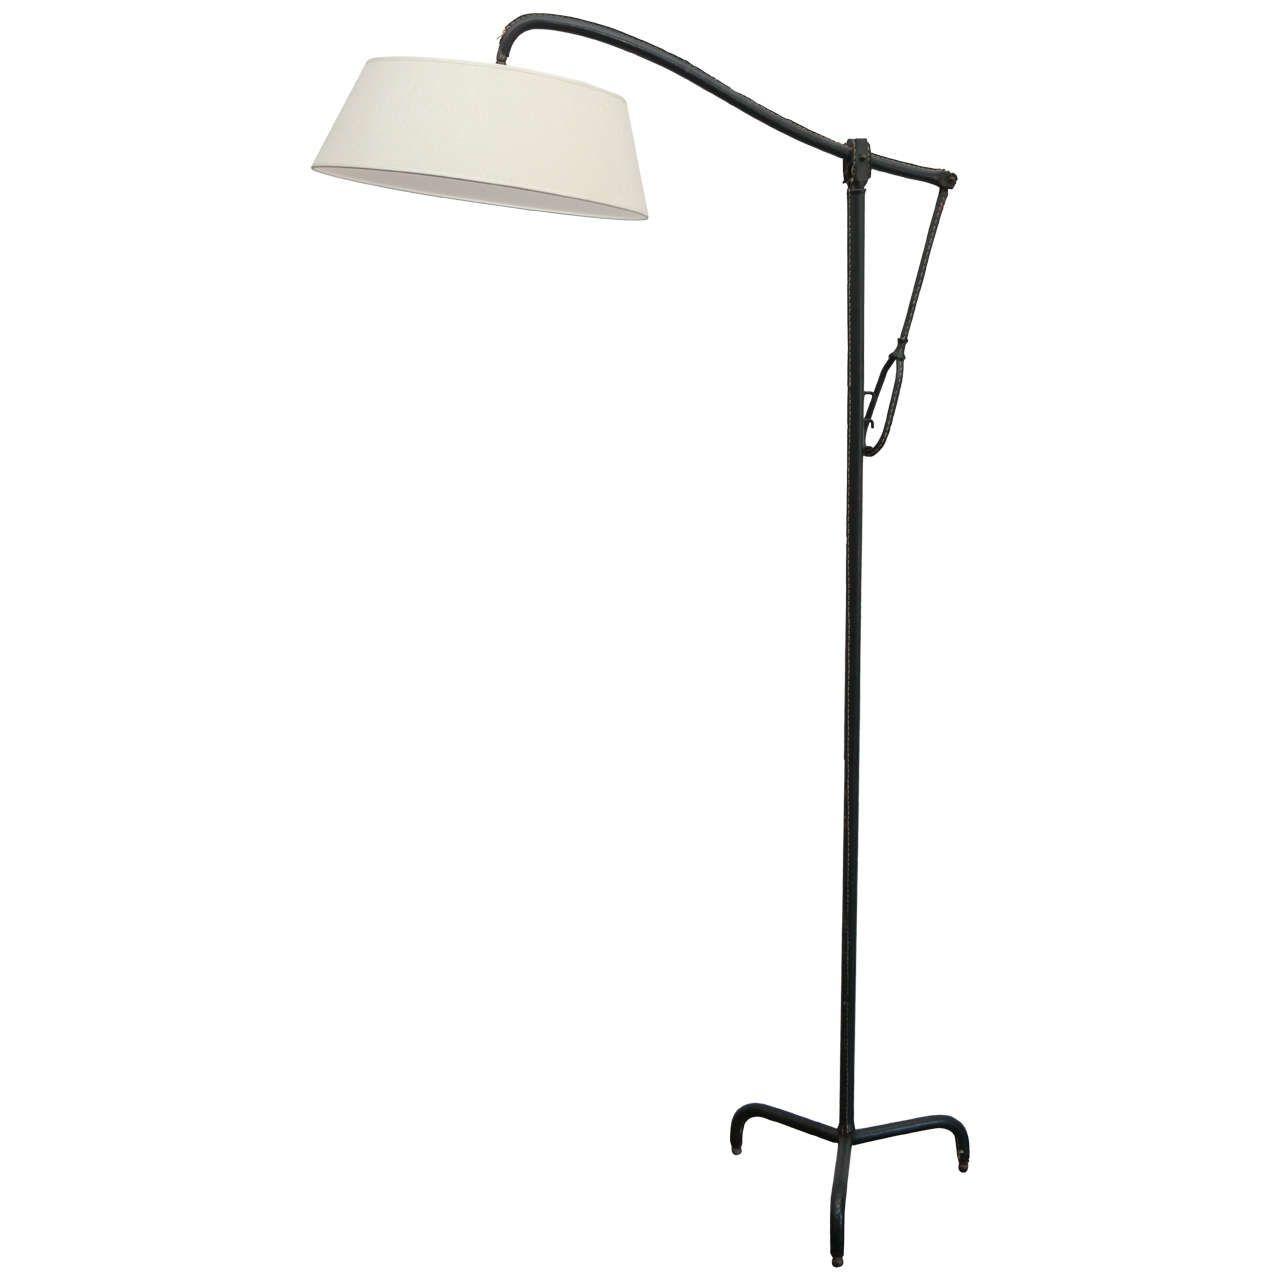 Vintage Jacques Adnet Floor Lamp In Green Stitched Hermes Leather 1stdibs Com Floor Lamp Vintage Floor Lamp Lamp